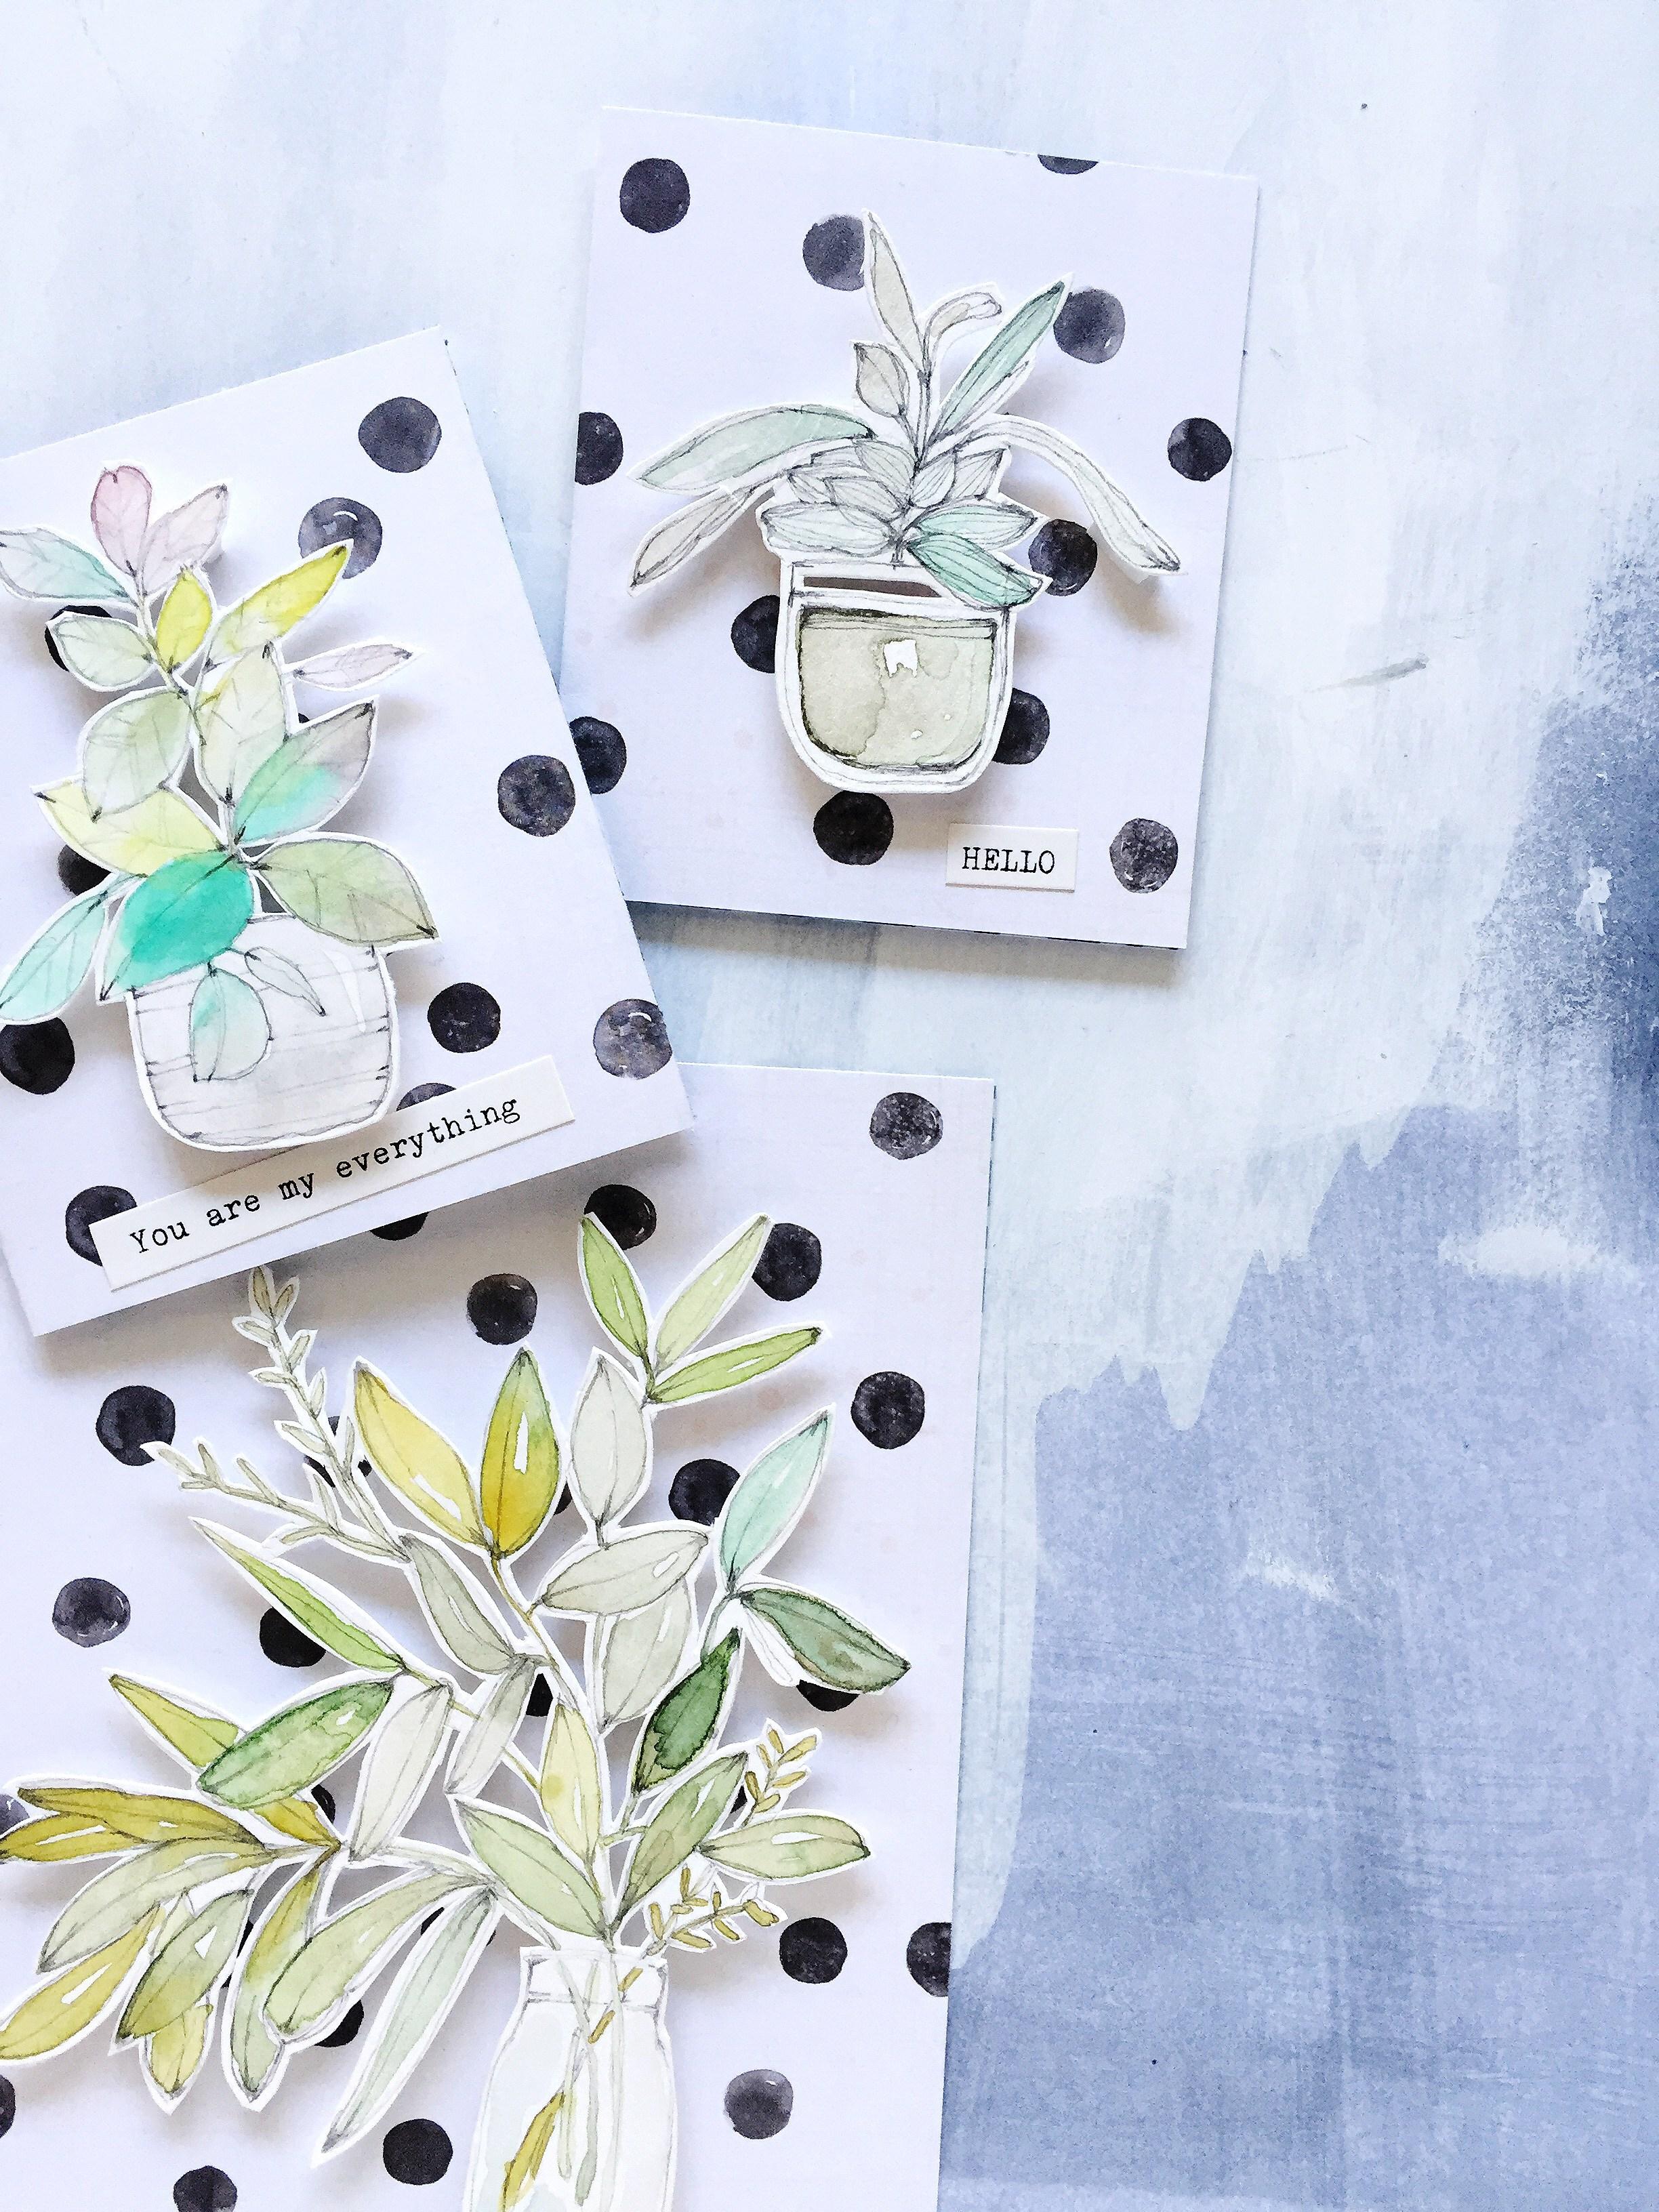 2448x3264 Darling Handmade Watercolor Cards